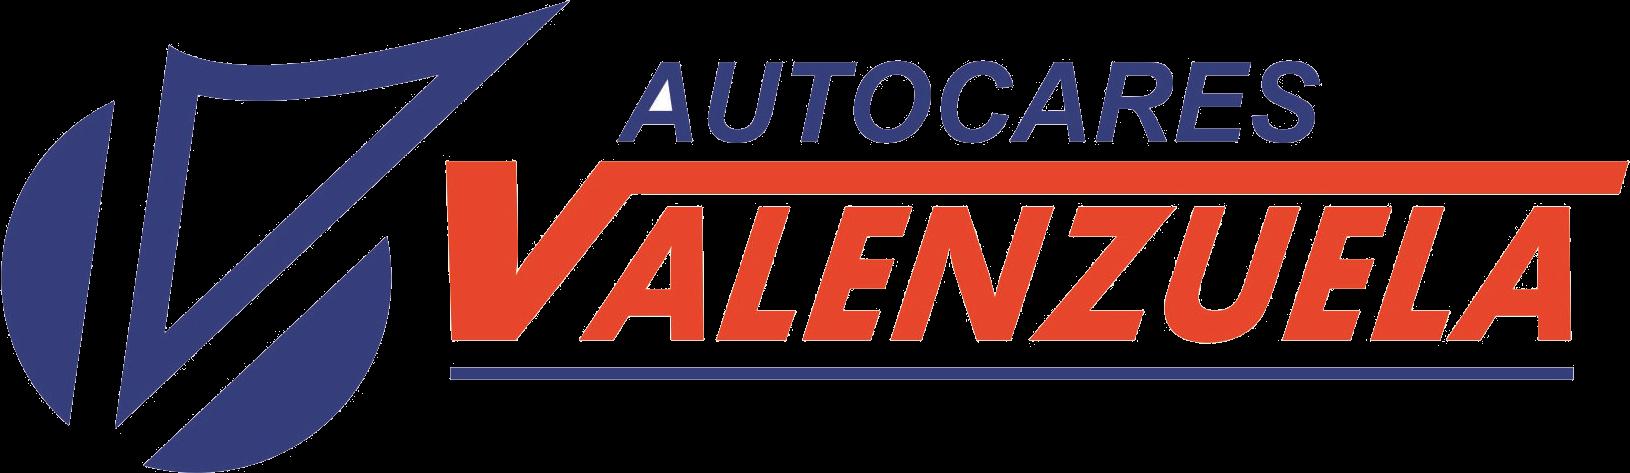 Autocares Valenzuela